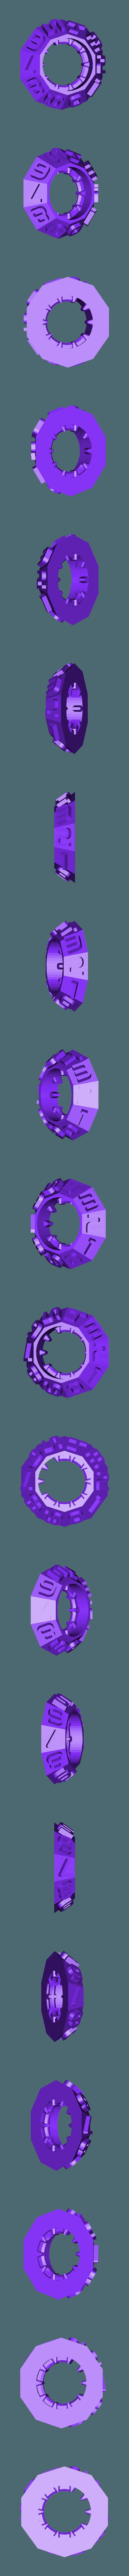 1R-2L.stl Download free STL file Latch Cryptex - Cerrojo • 3D printable design, xutano